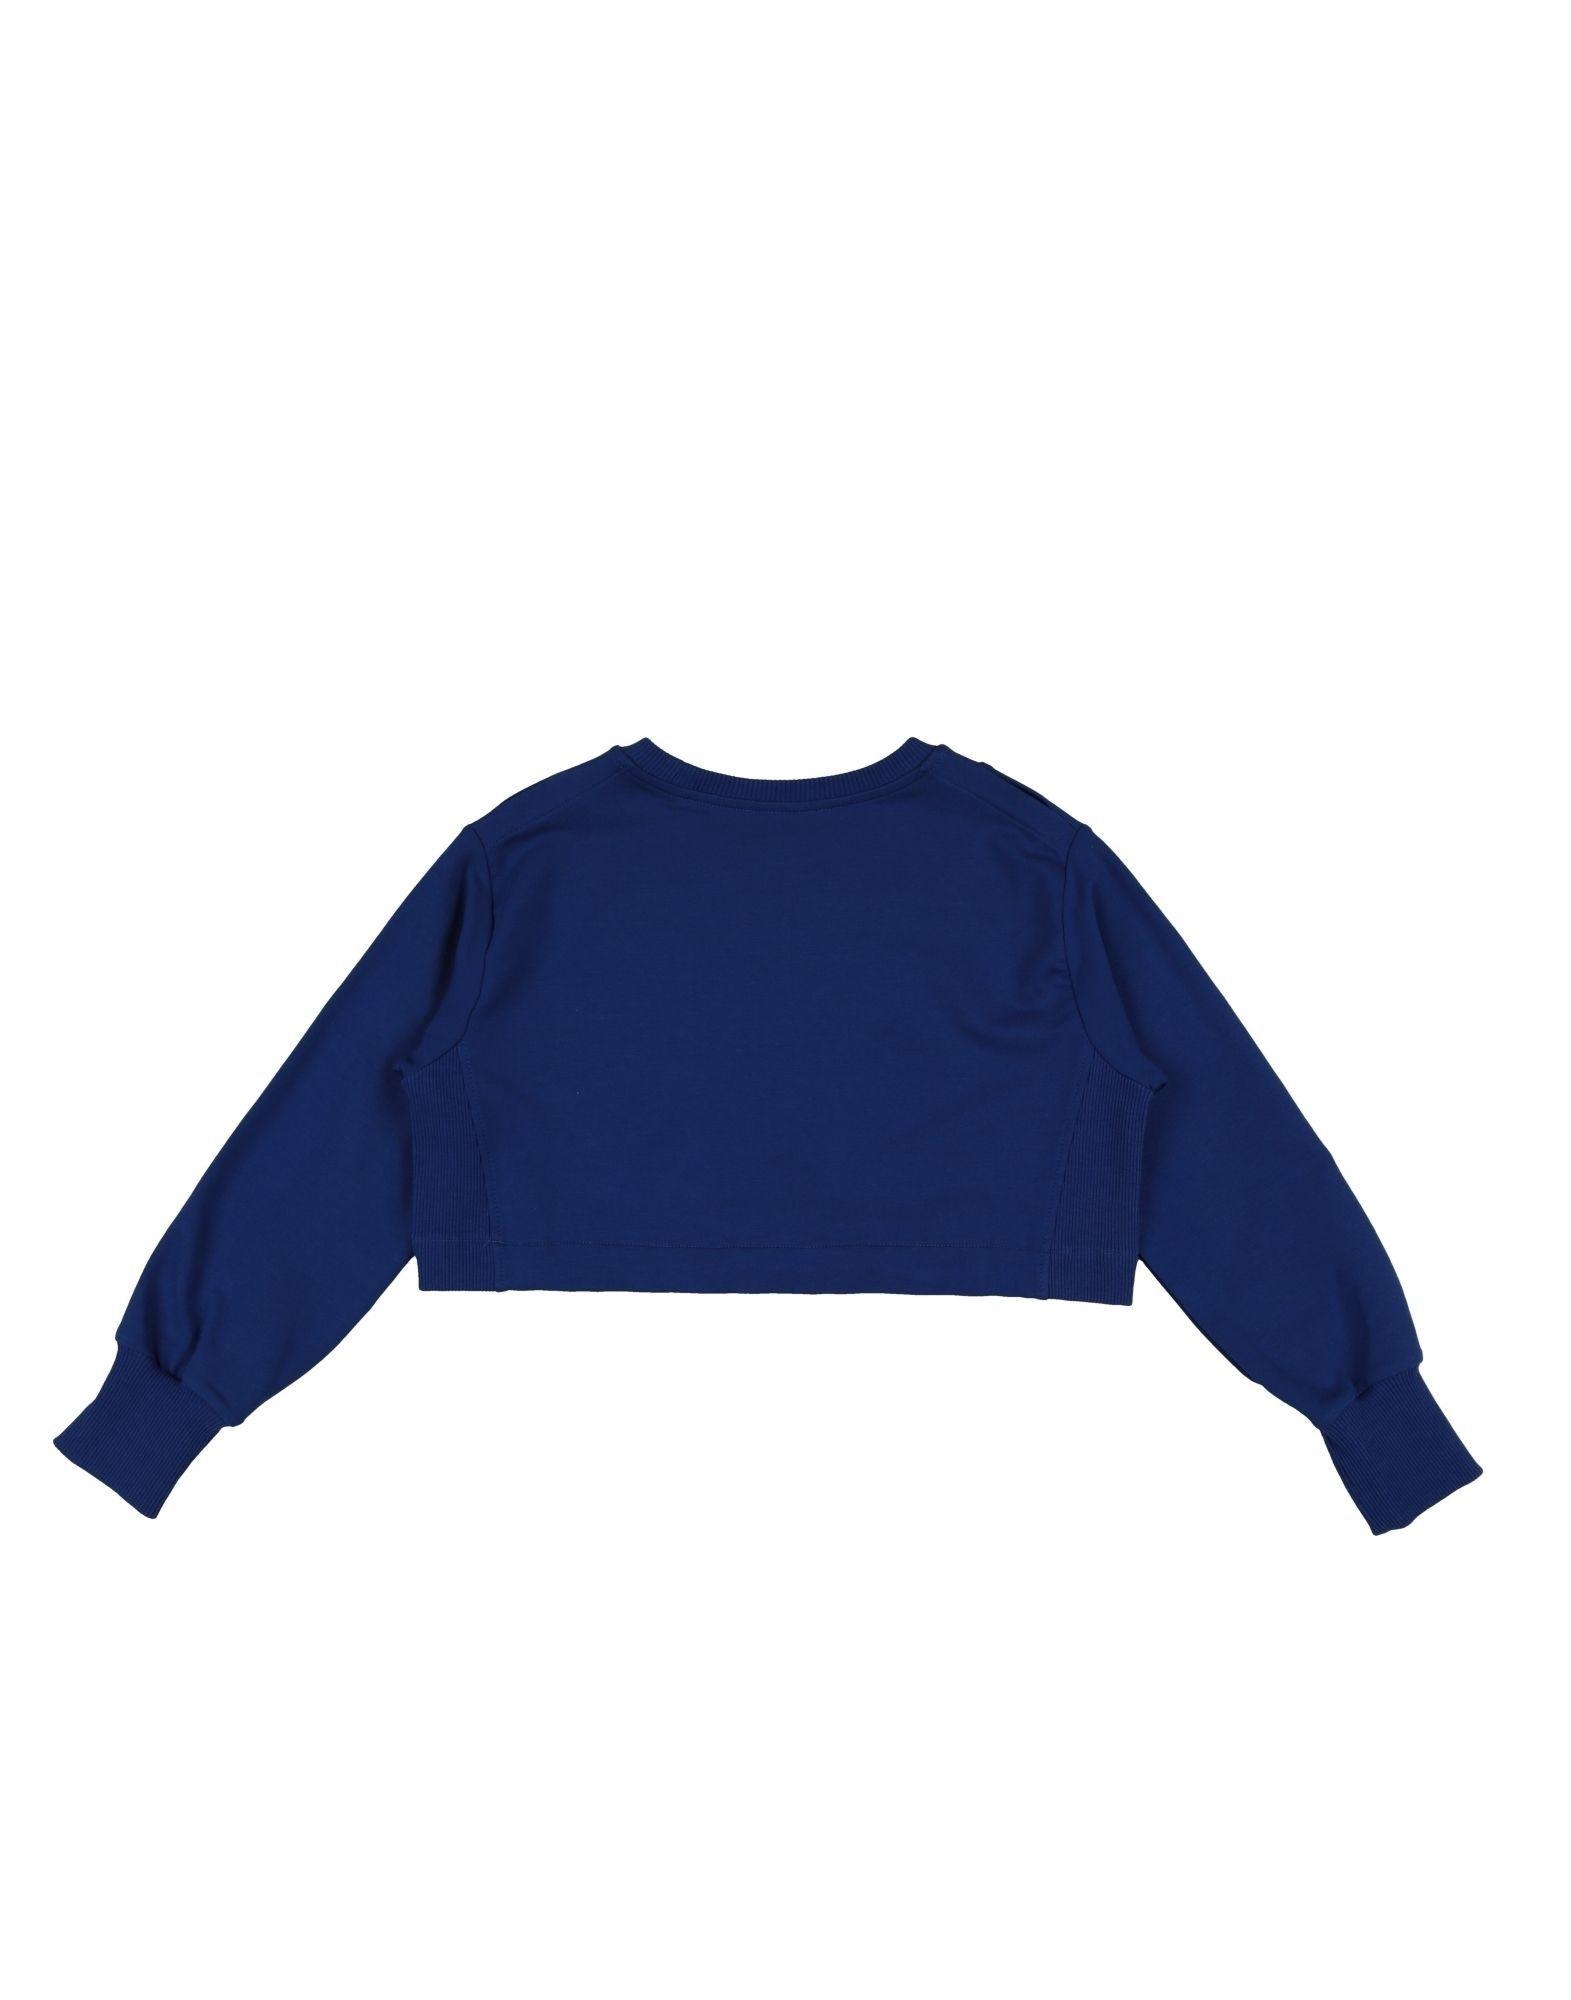 TOPWEAR Girl Jijil Jolie Bright blue Cotton